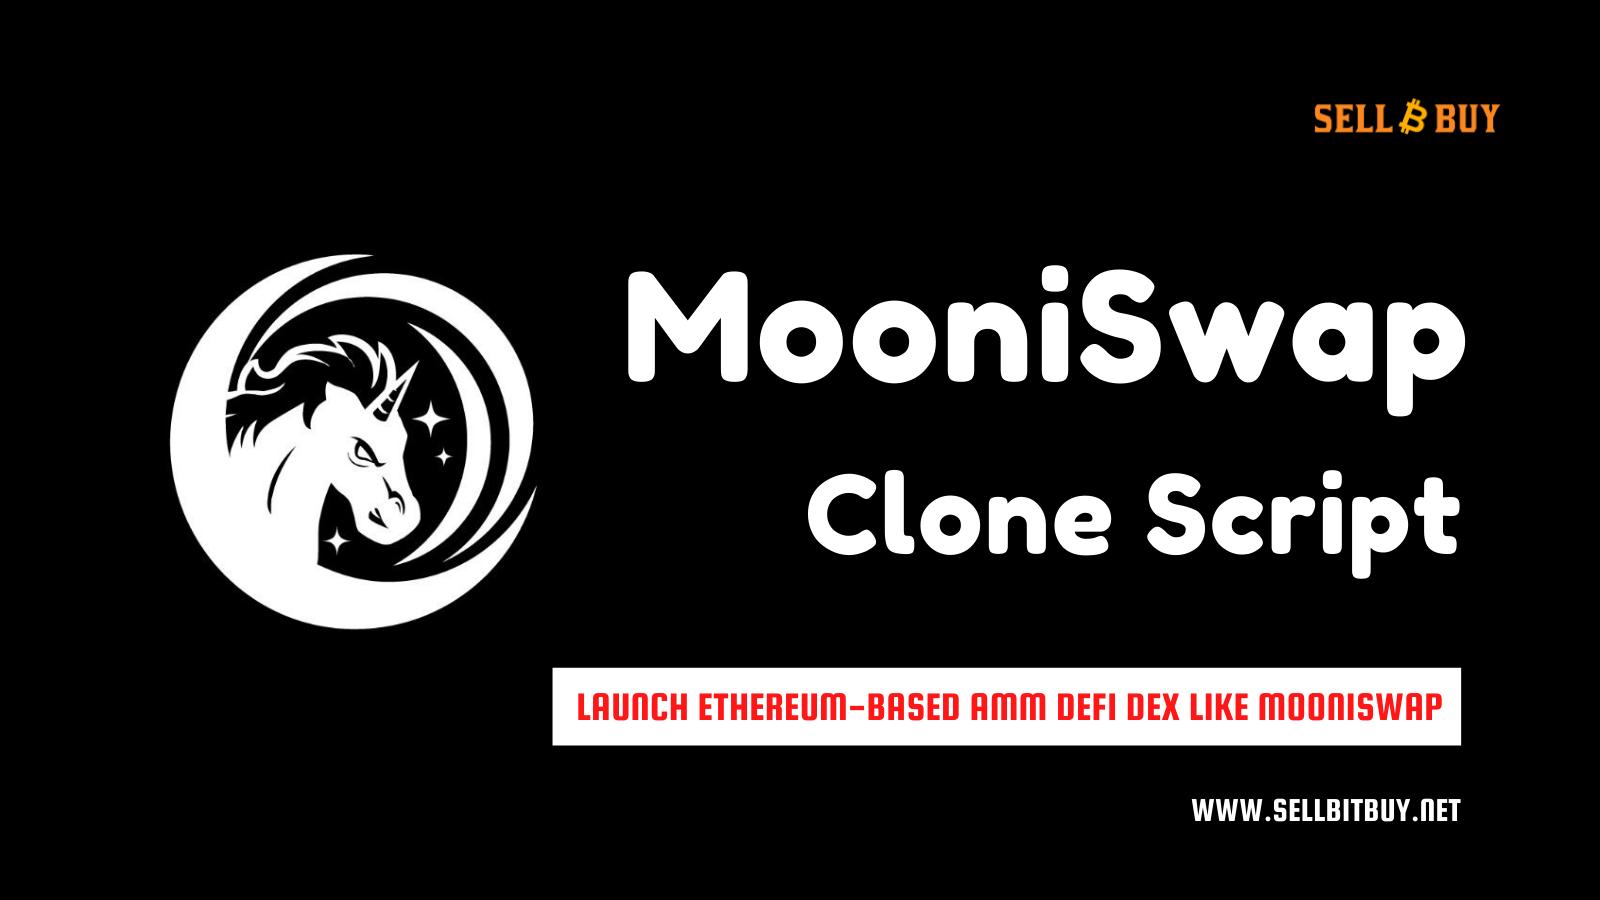 MooniSwap Clone Script - To Launch MooniSwap Like Ethereum Based Decentralized Exchange